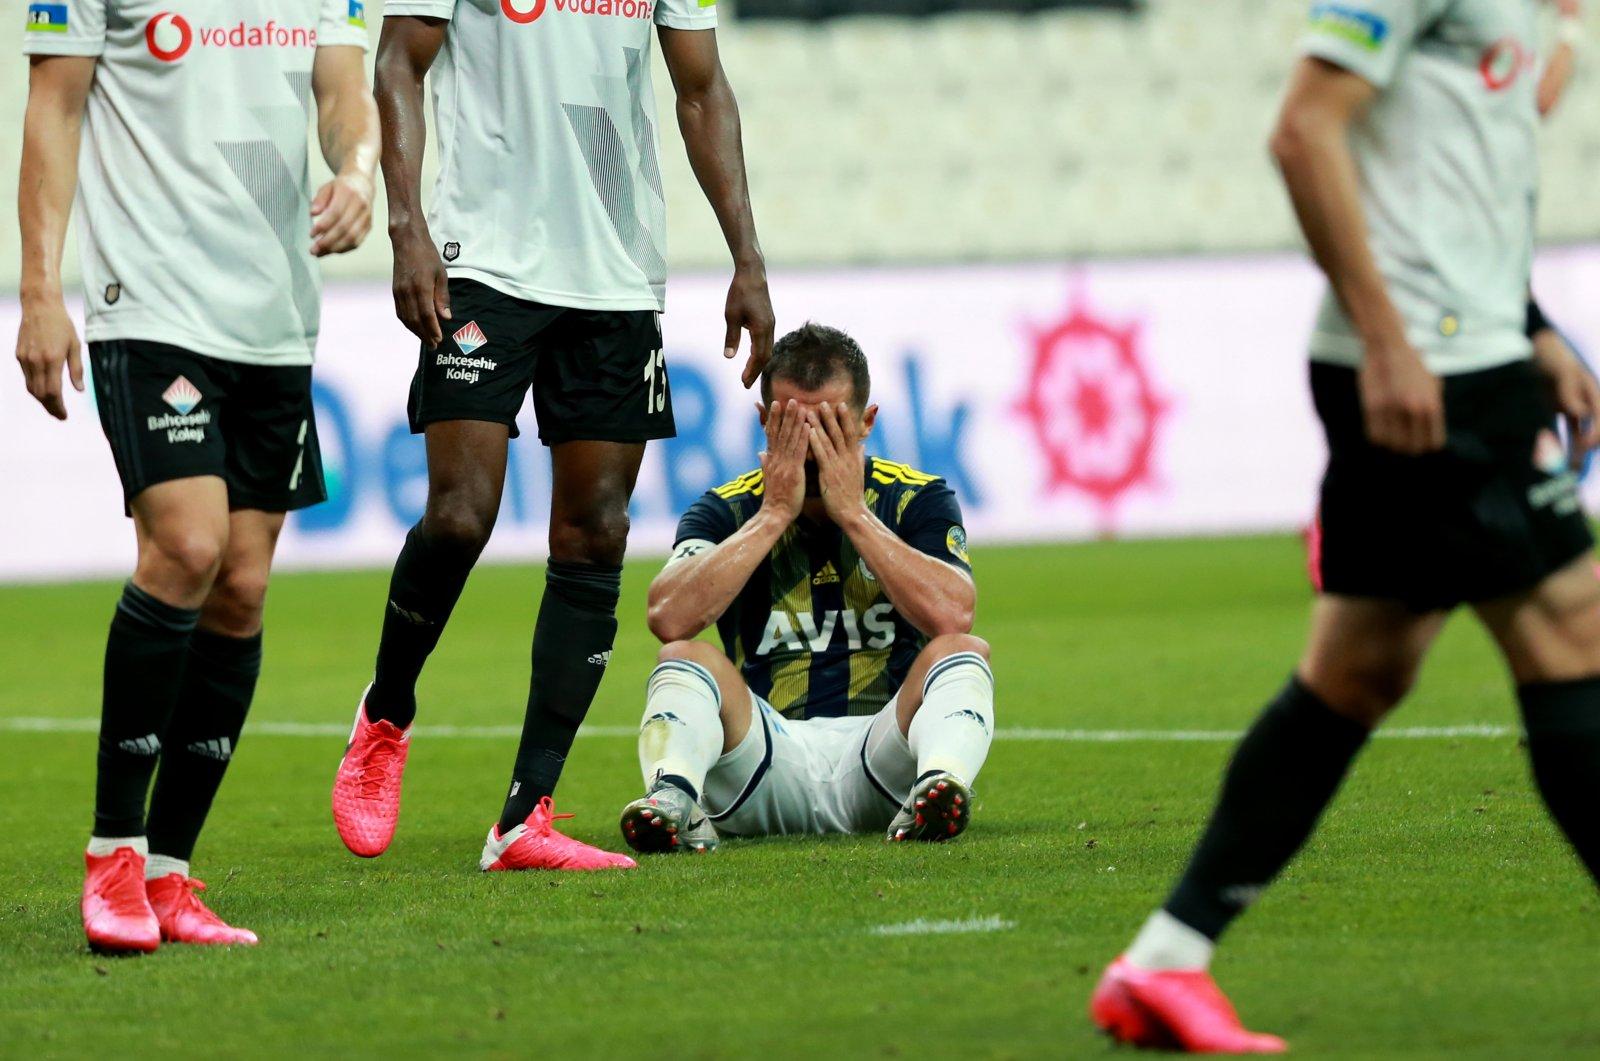 Fenerbahçe's Emre Belözoğlu reacts during a Süper Lig match against Beşiktaş in Istanbul, Turkey, July 19, 2020. (AA Photo)